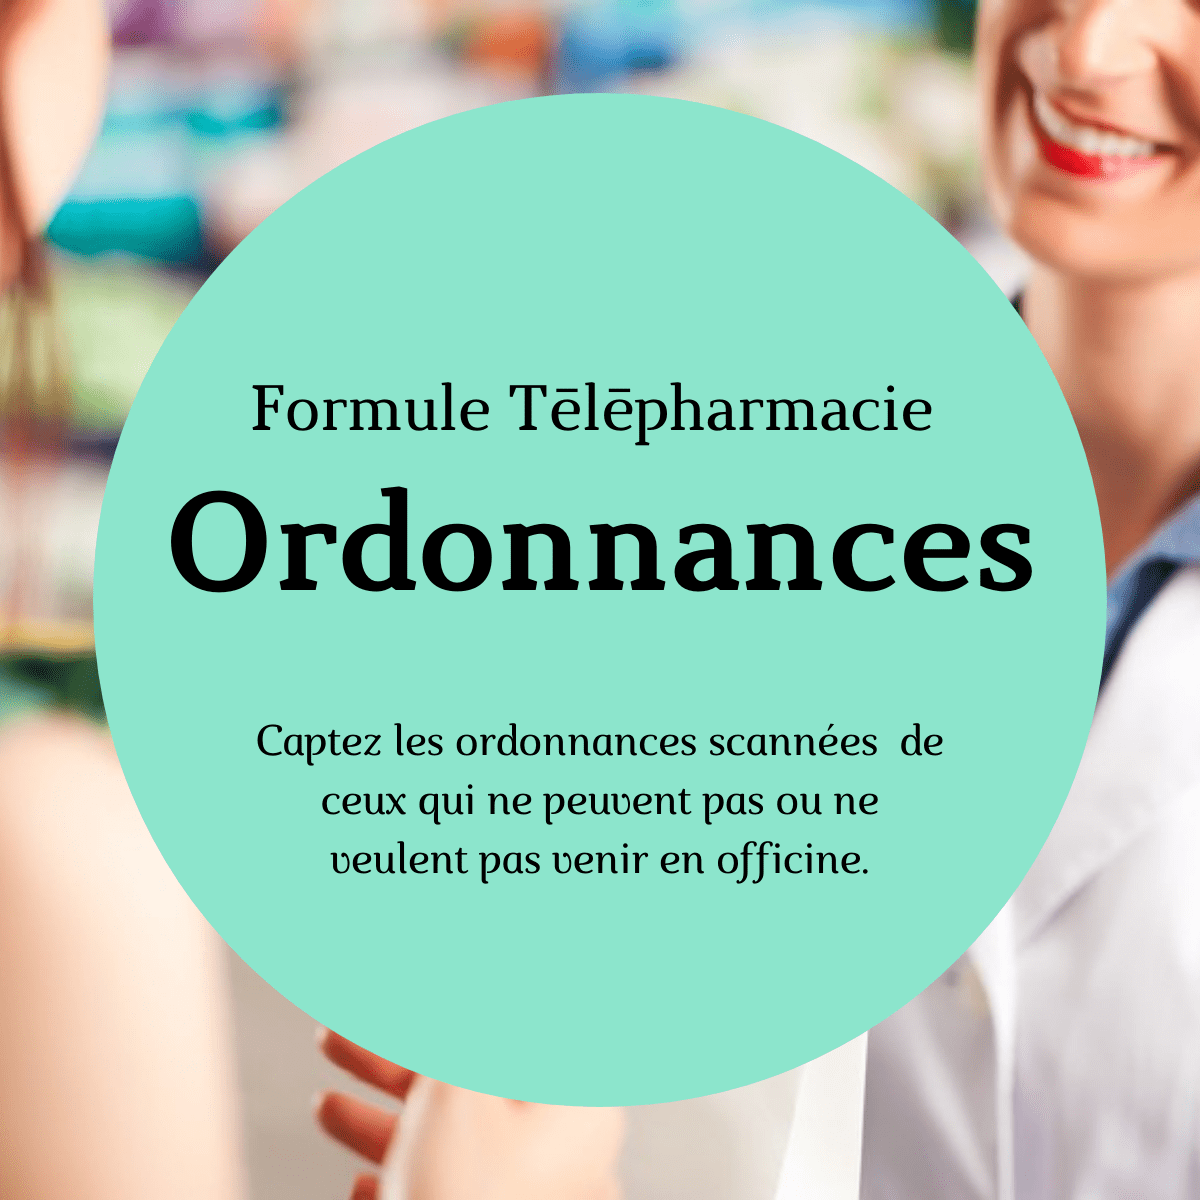 Formule ordonnance pharmacie